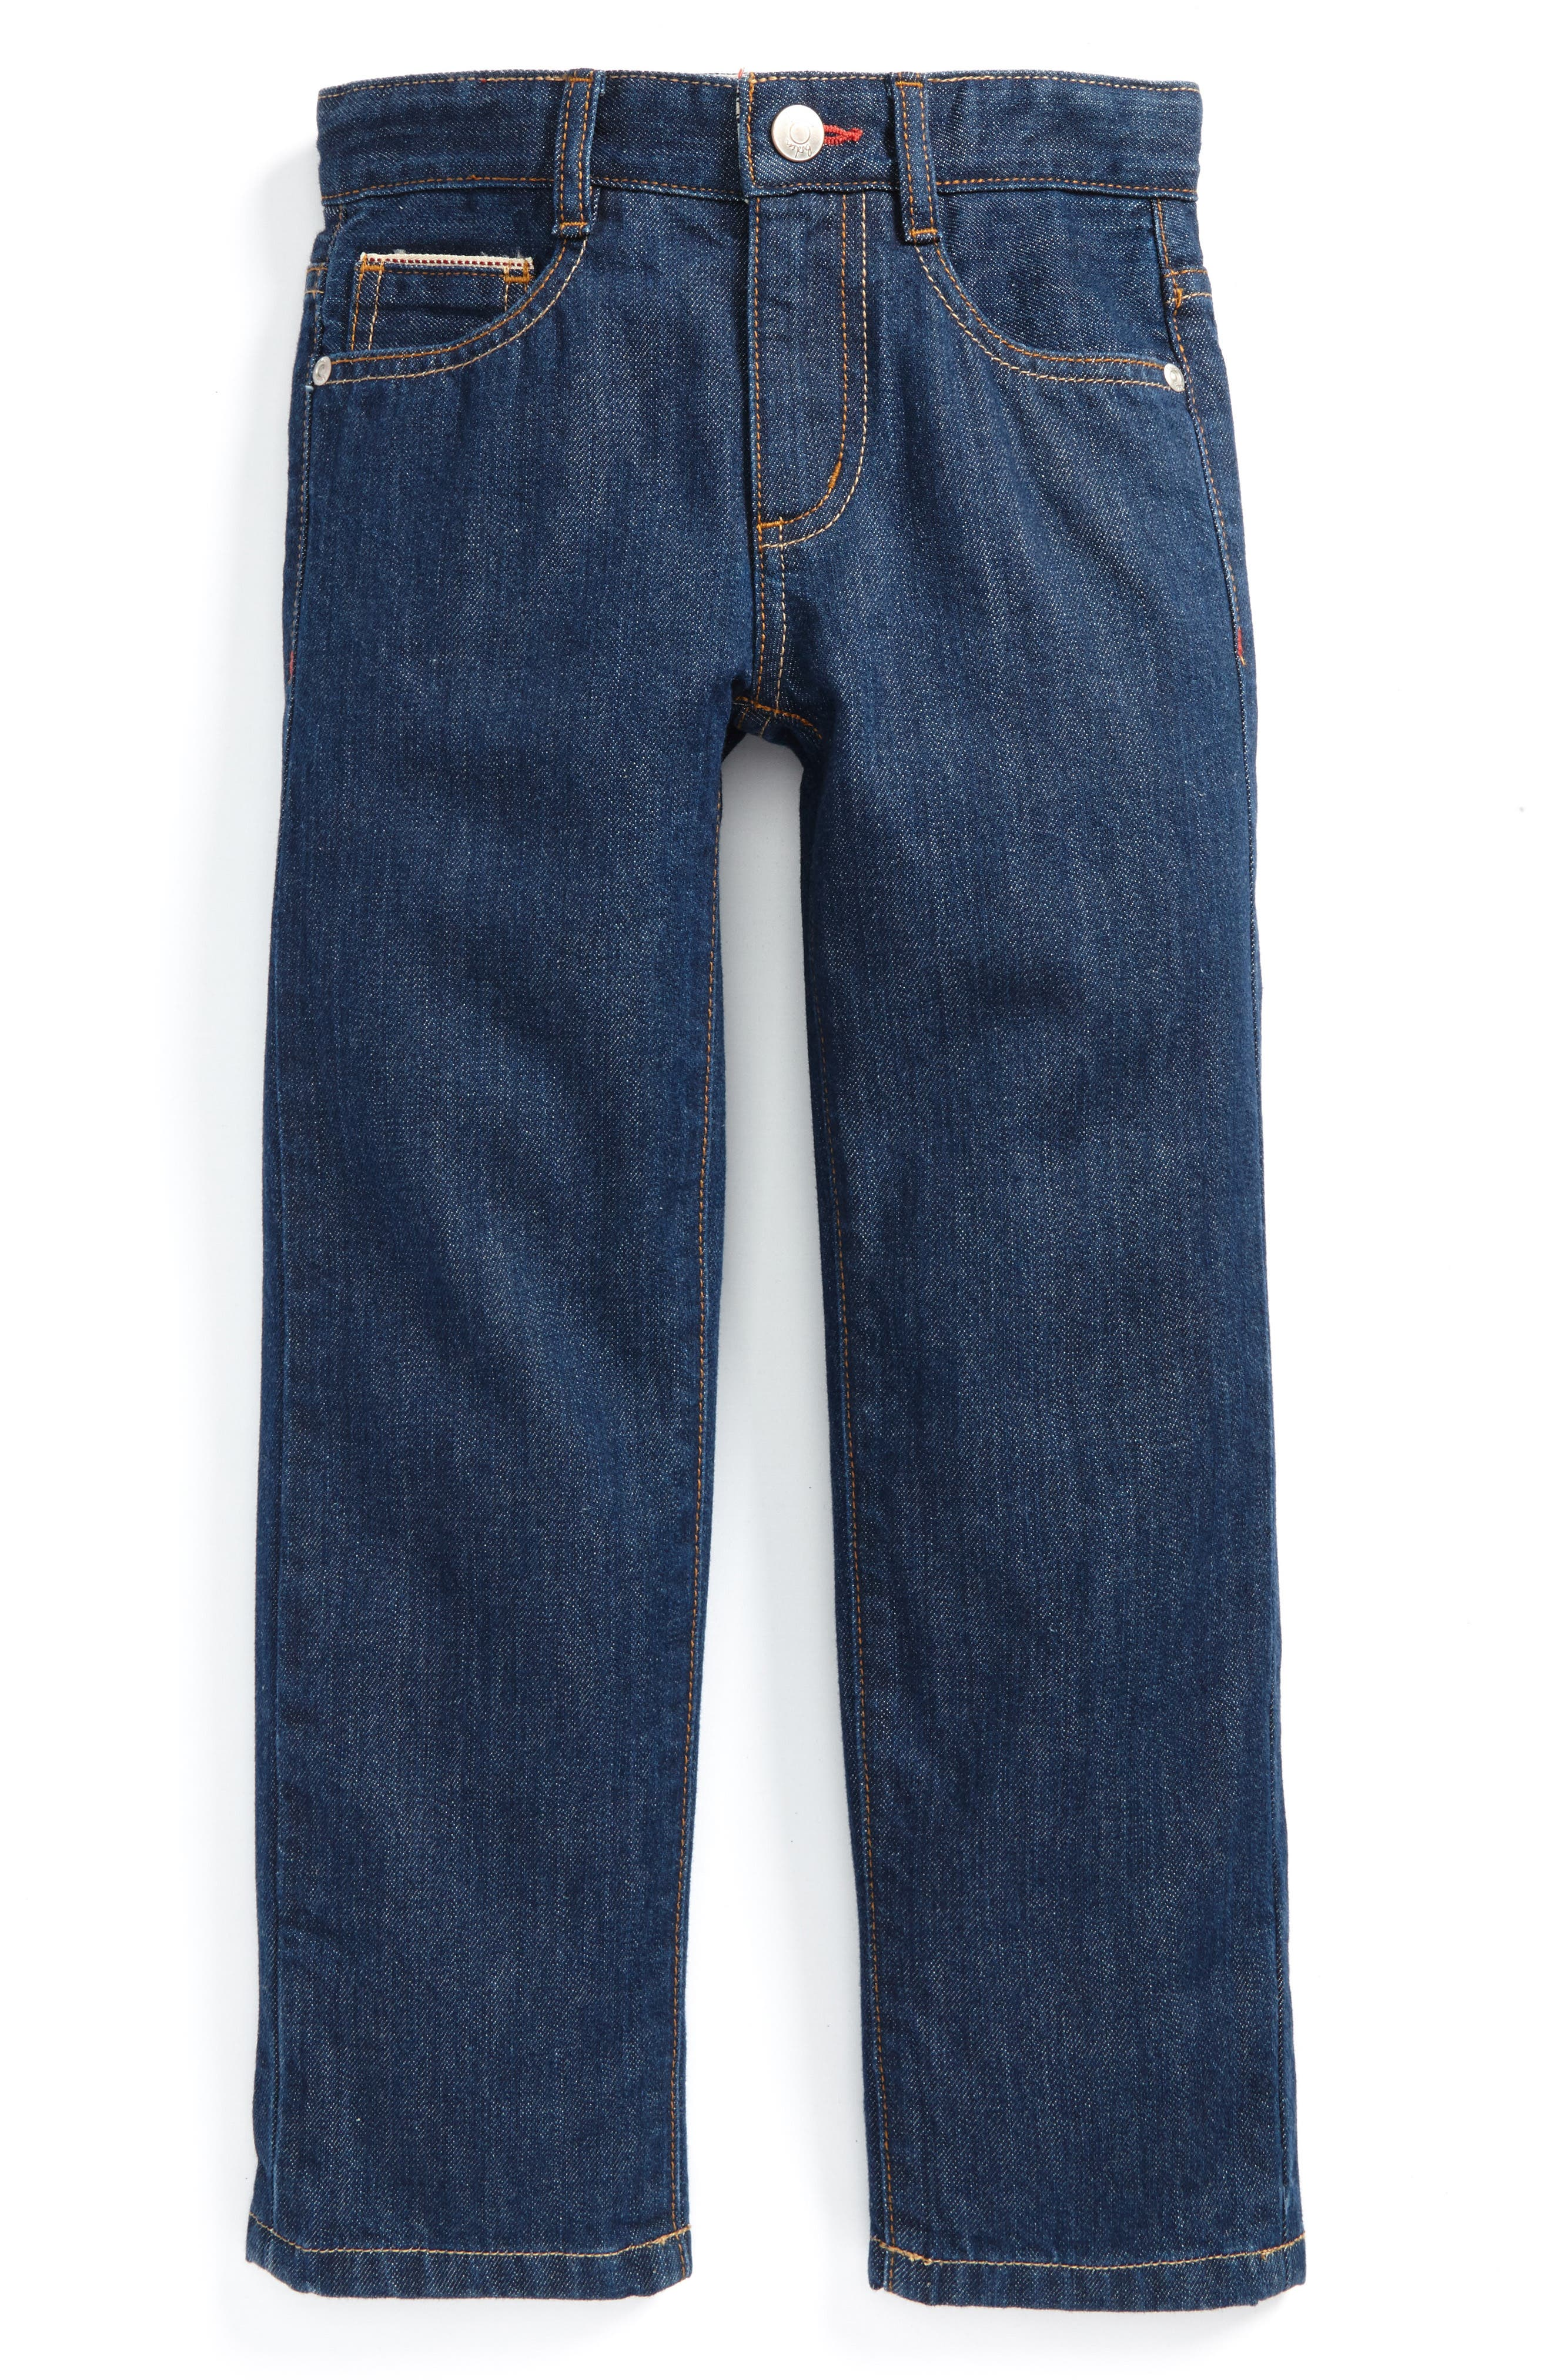 Main Image - Mini Boden Straight Leg Jeans (Toddler Boys, Little Boys & Big Boys)